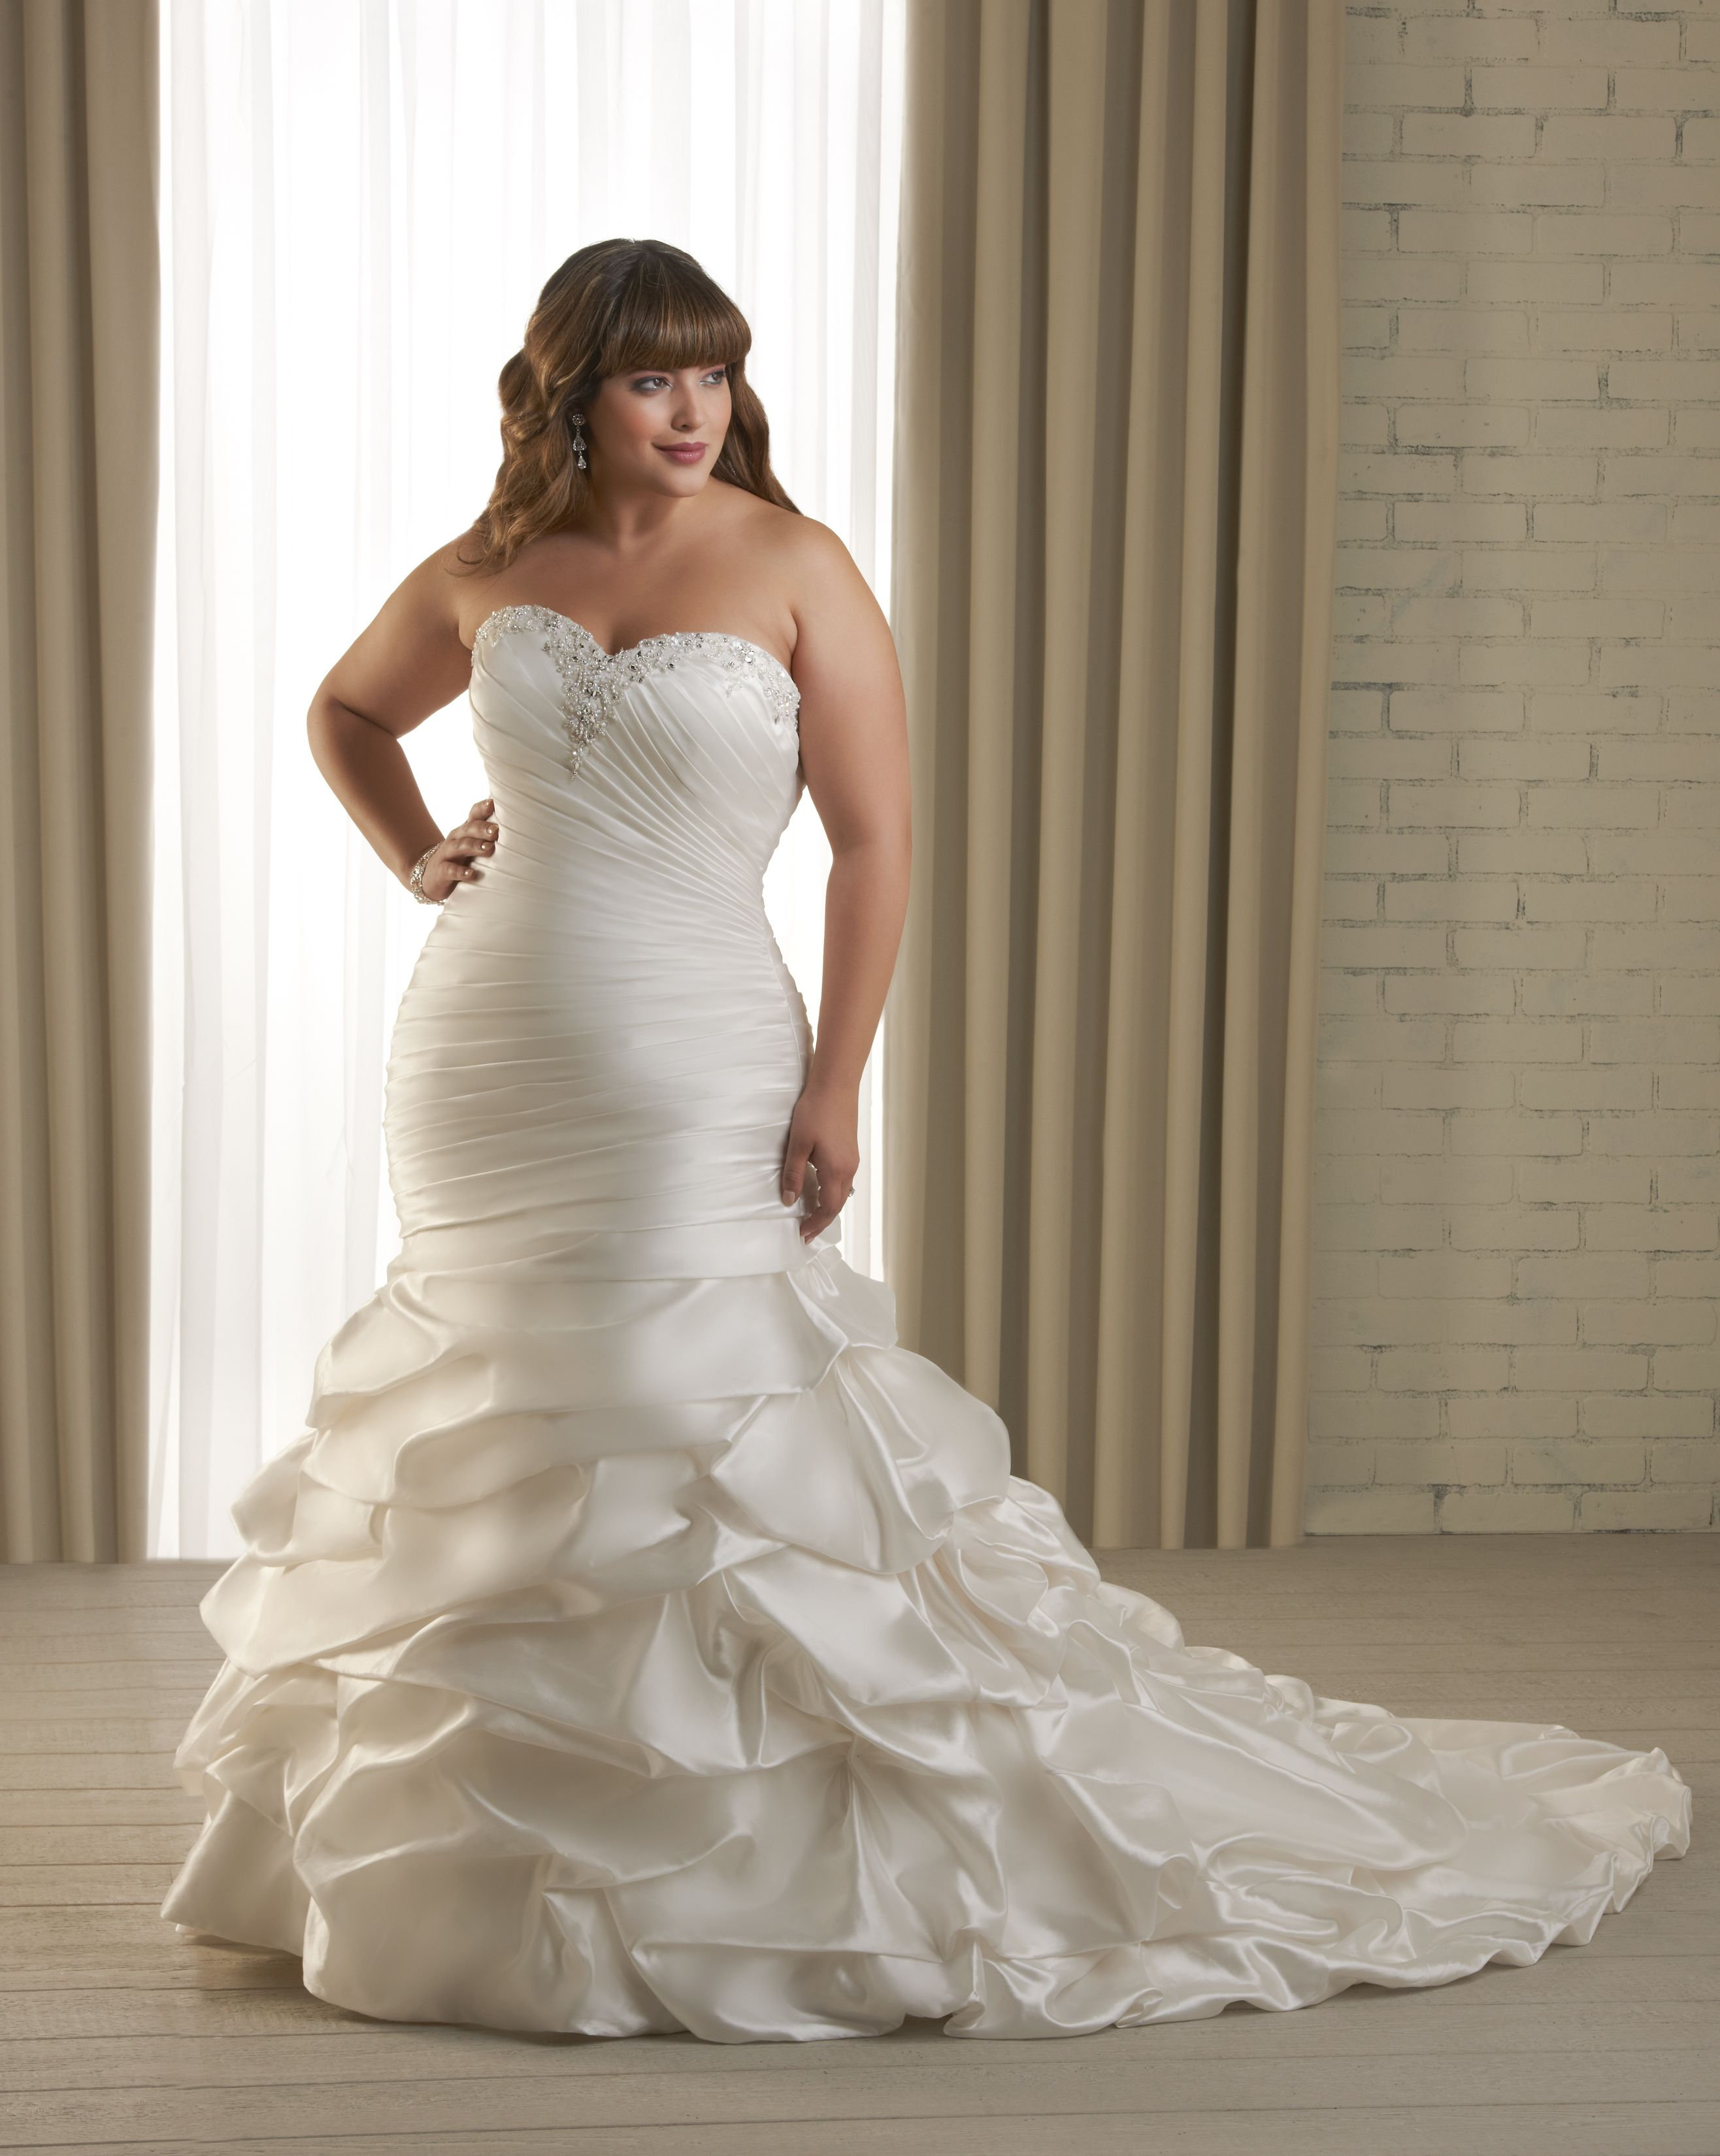 Wedding dresses for curvy brides  Dress for the Curvy Bride  Christian wed  Pinterest  Curvy